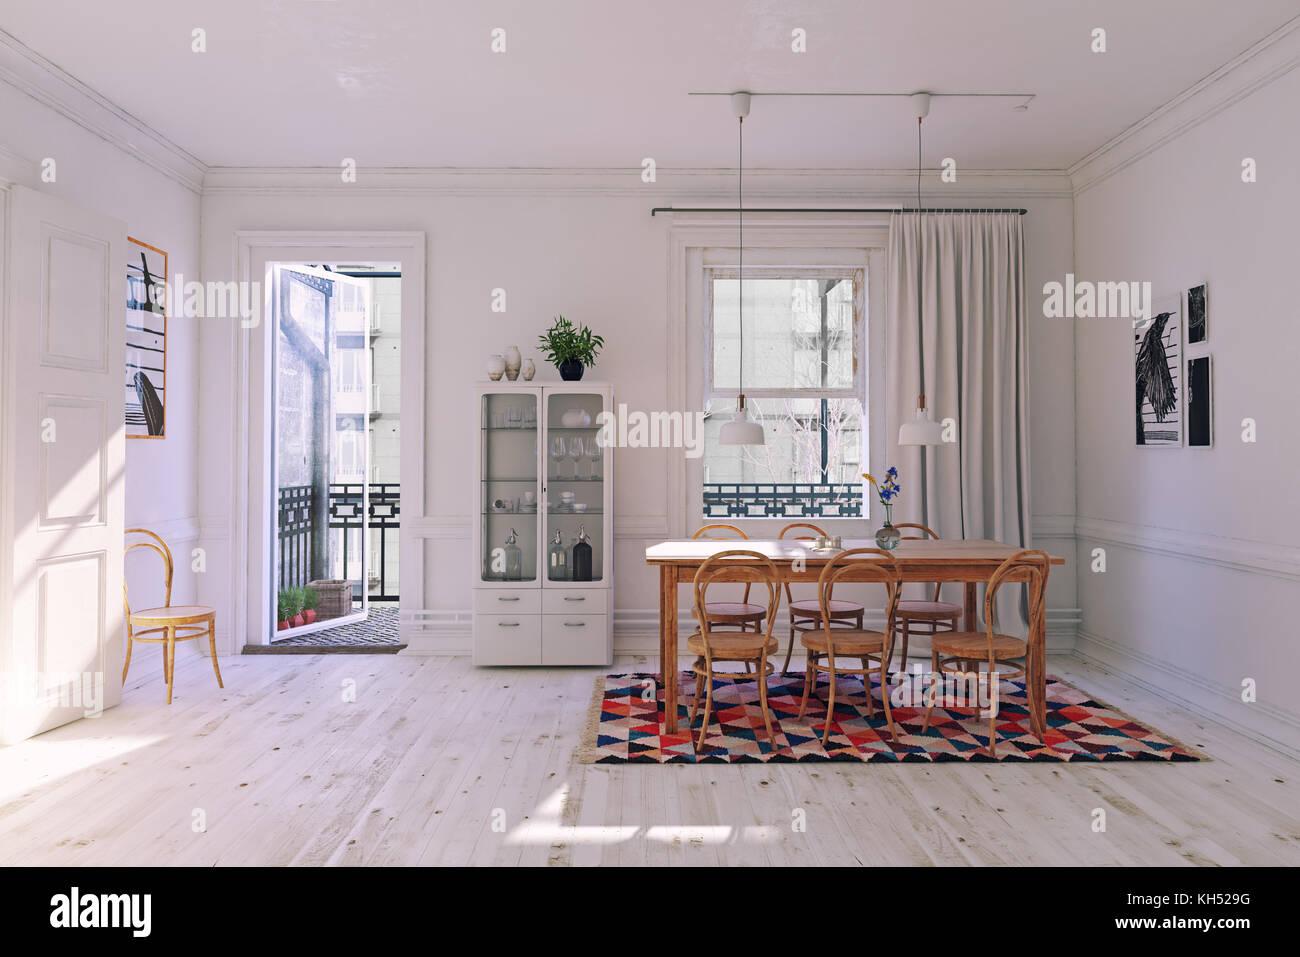 Scandi Design Stockfotos & Scandi Design Bilder - Alamy